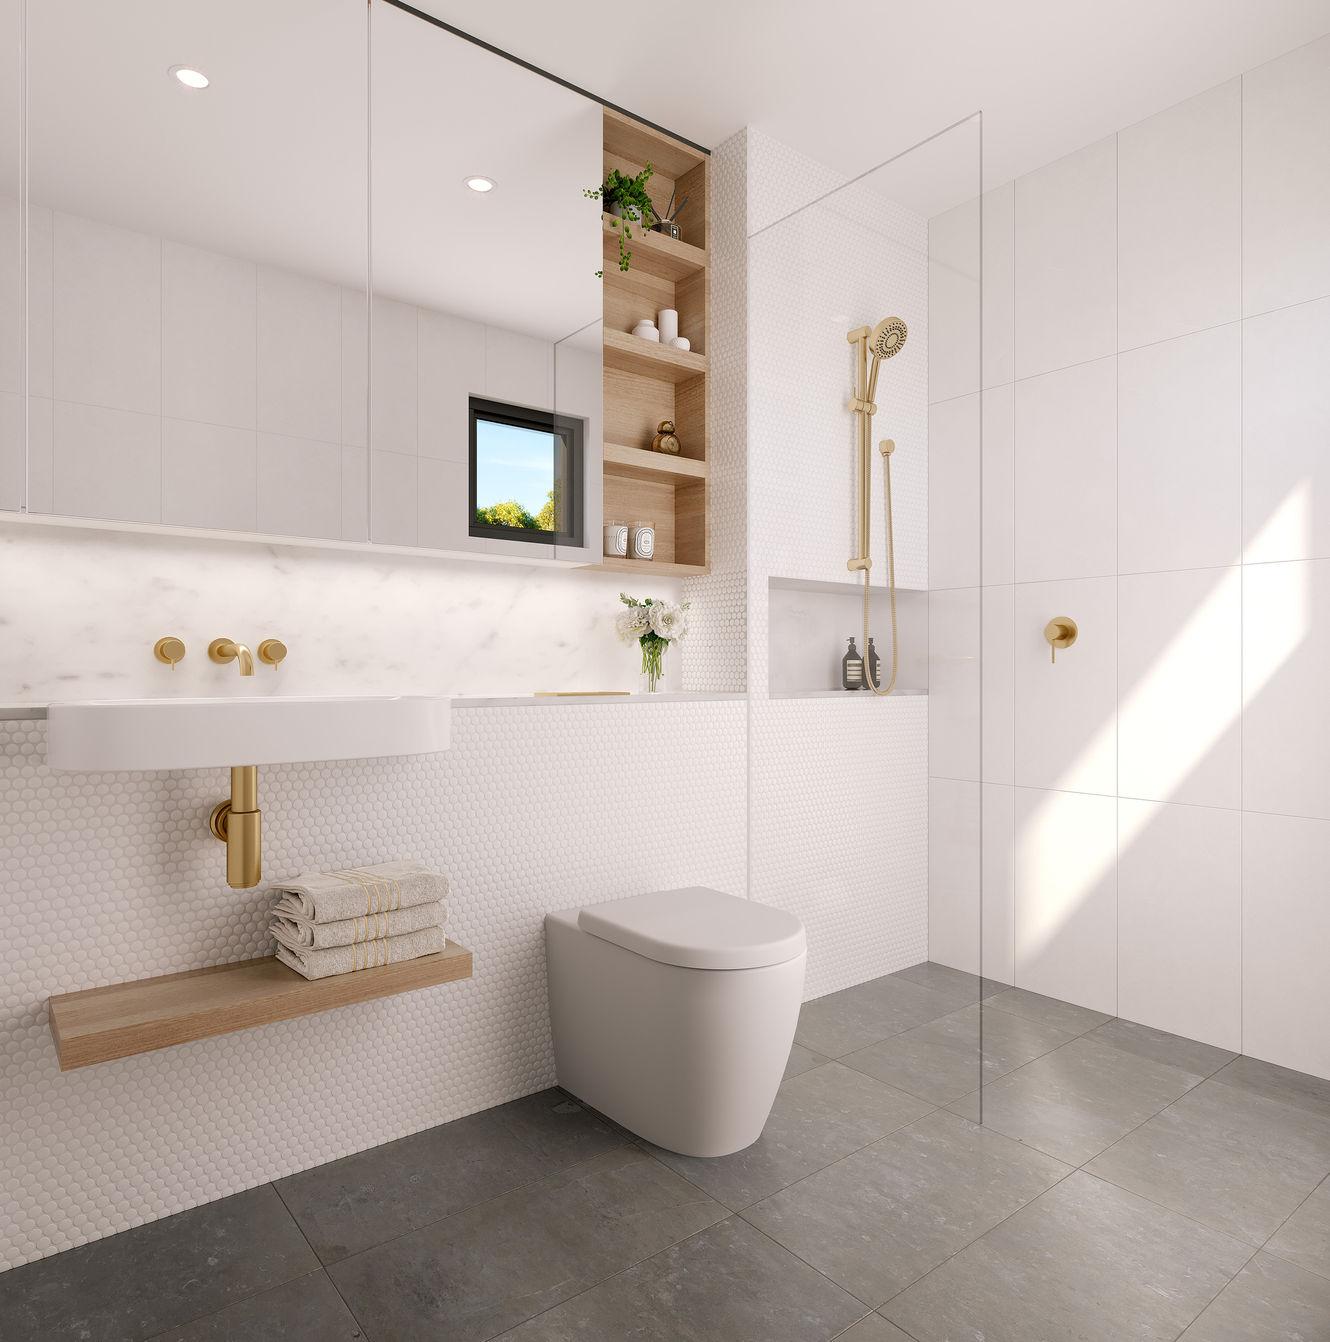 4_6Gros_Int_Bathroom_4C_Alt_Lighting.jpg